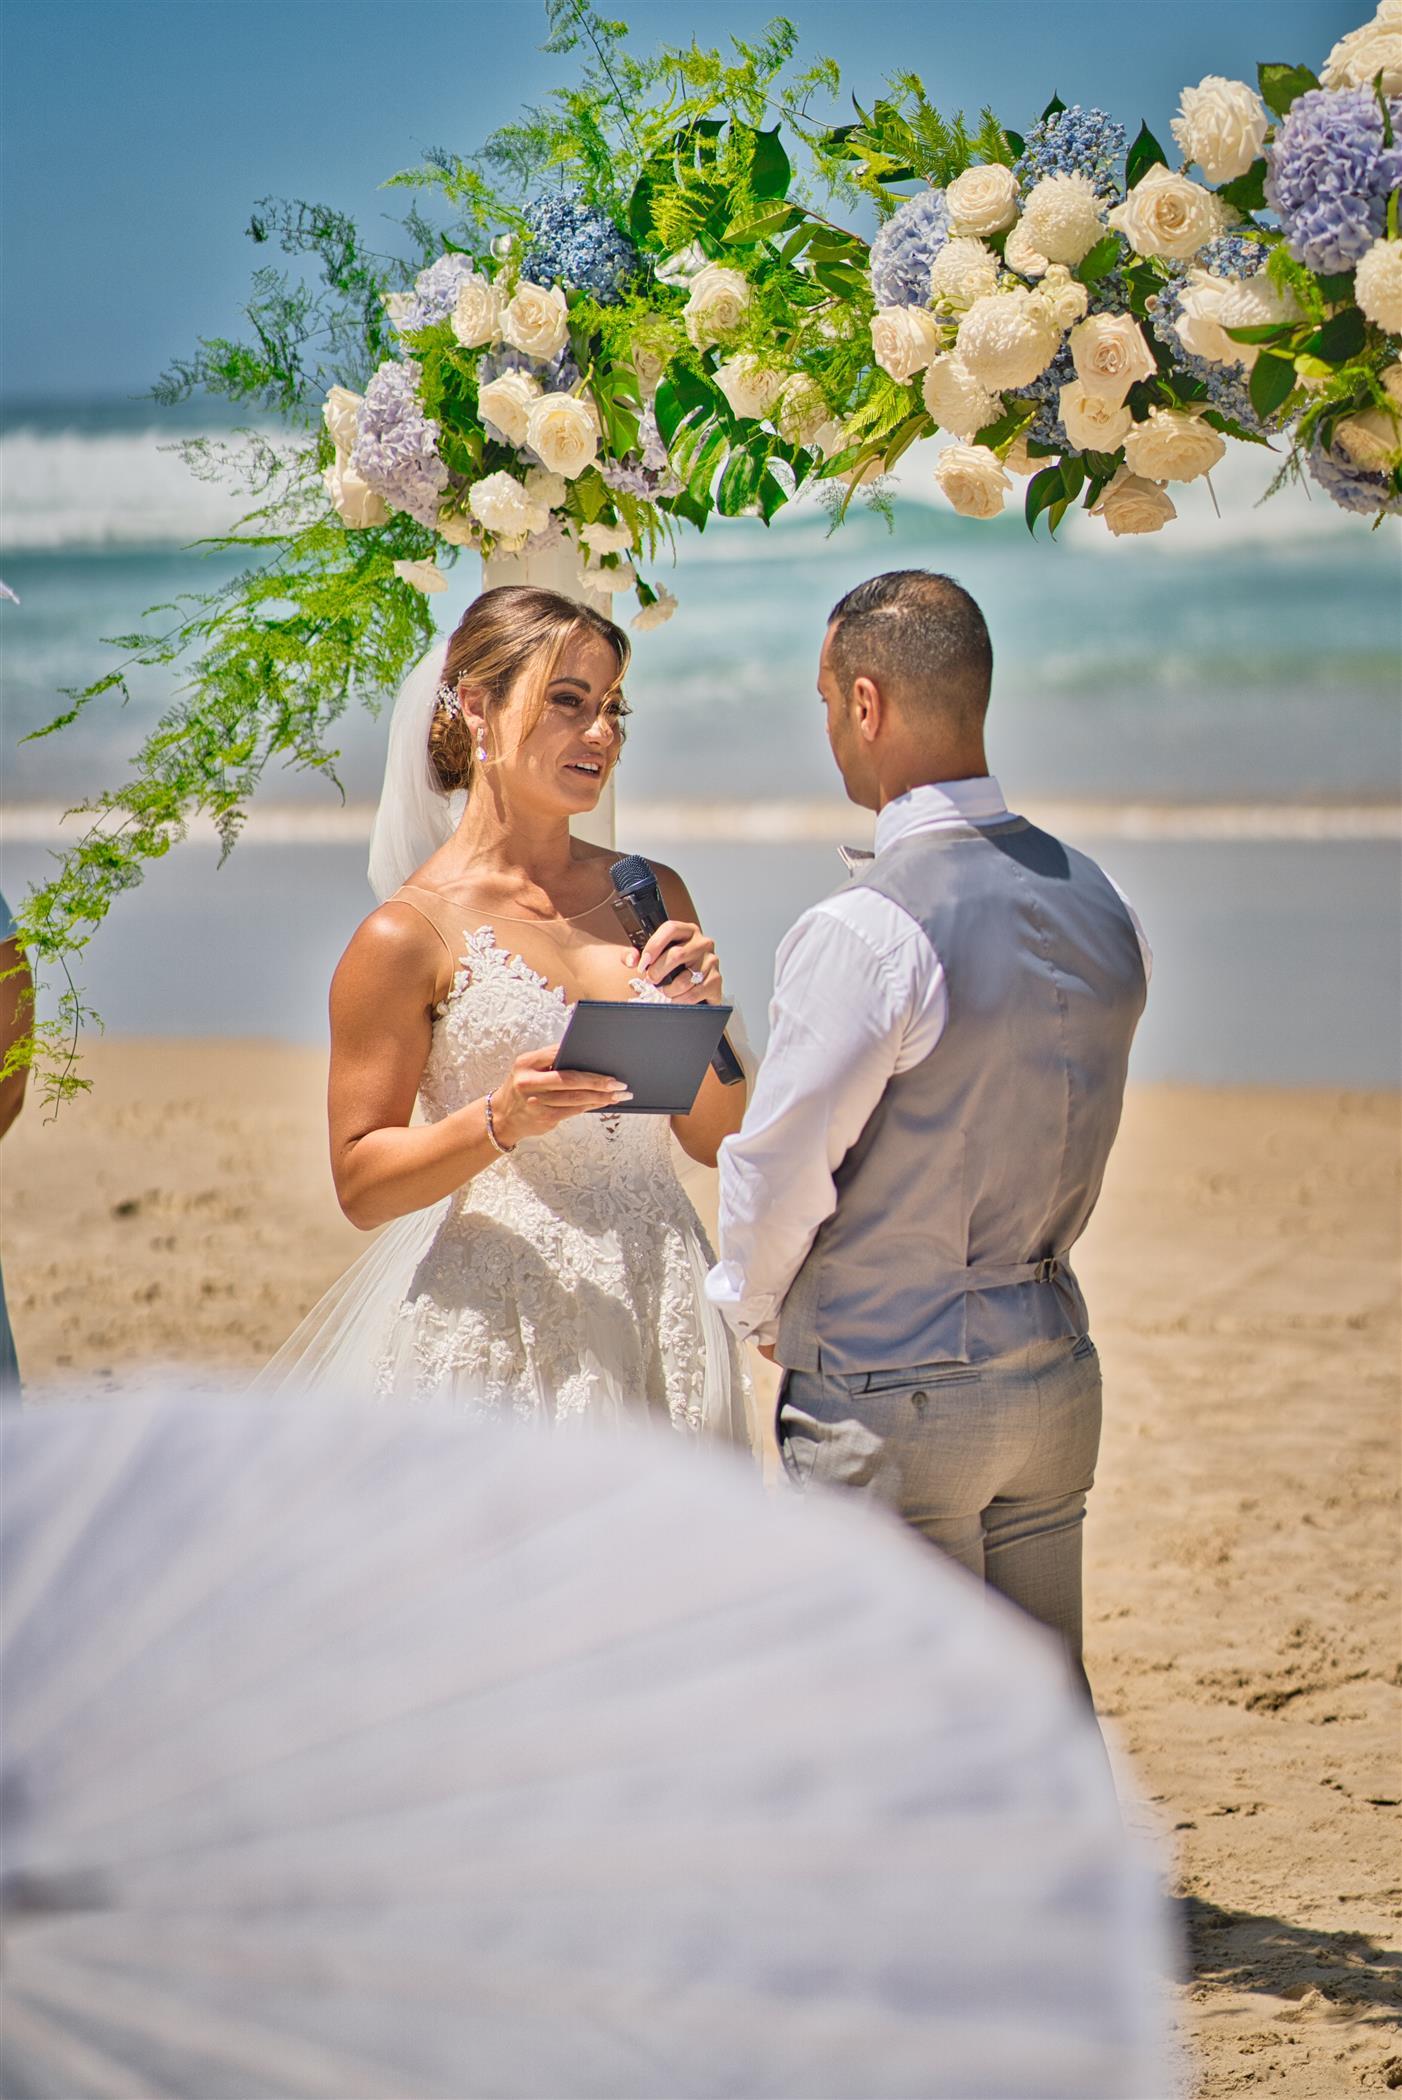 Byron Bay Wedding Photography and Videography